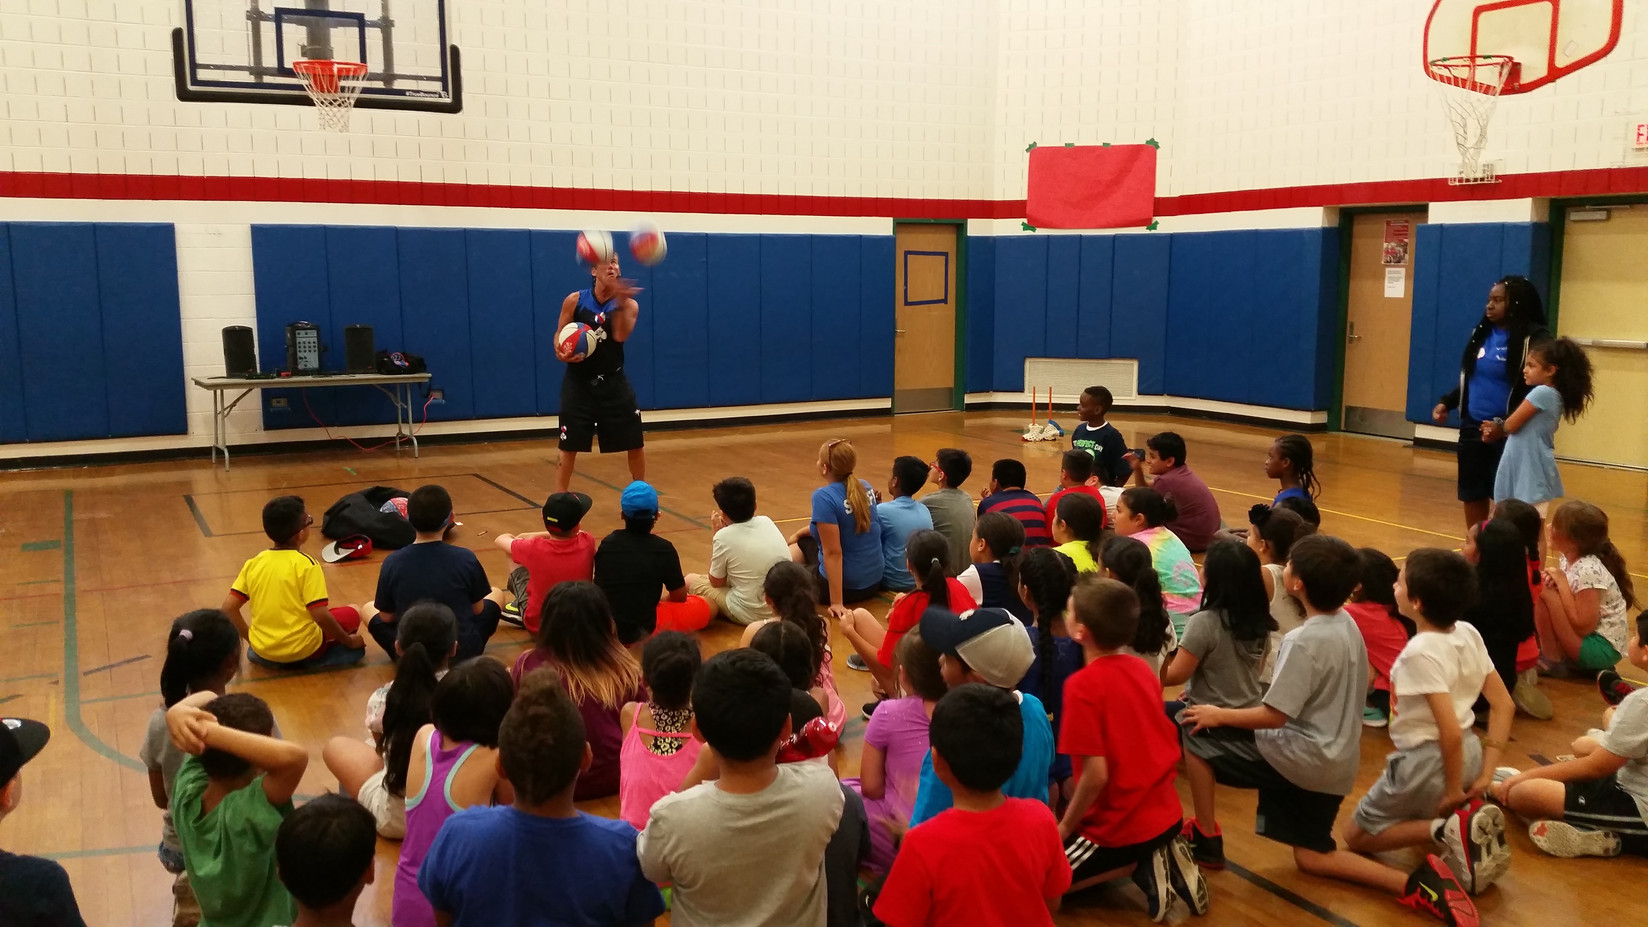 Basketball-Trick-At-School.jpg